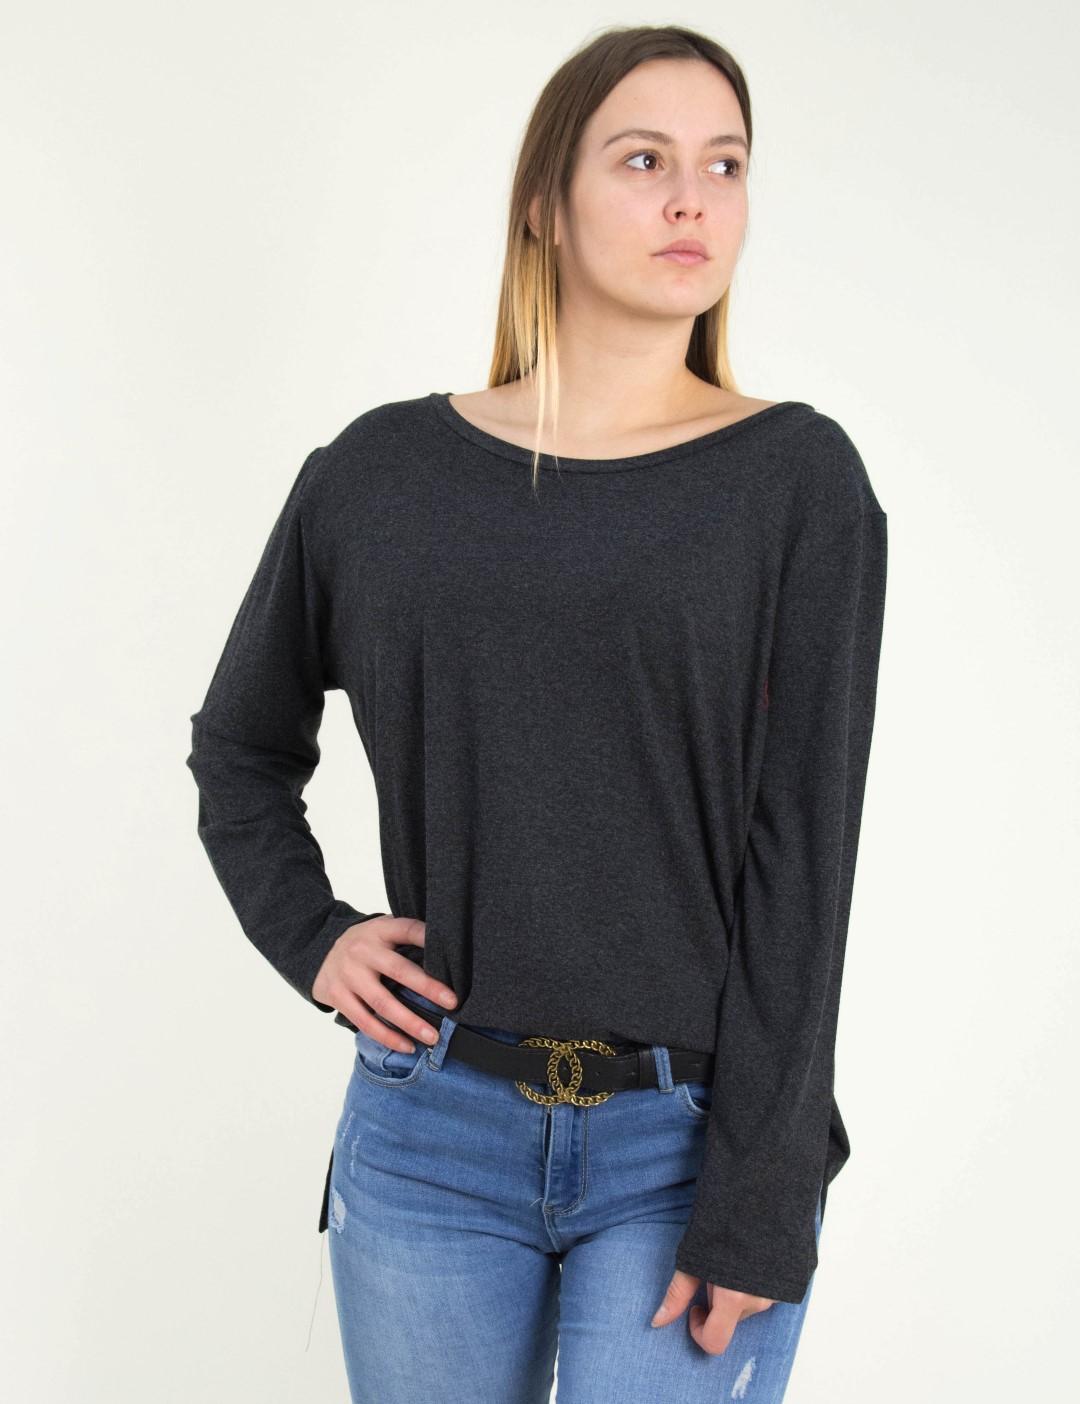 d8ef3f146747 Γυναικεία γκρι ασσύμετρη μπλούζα Oversize 11701807